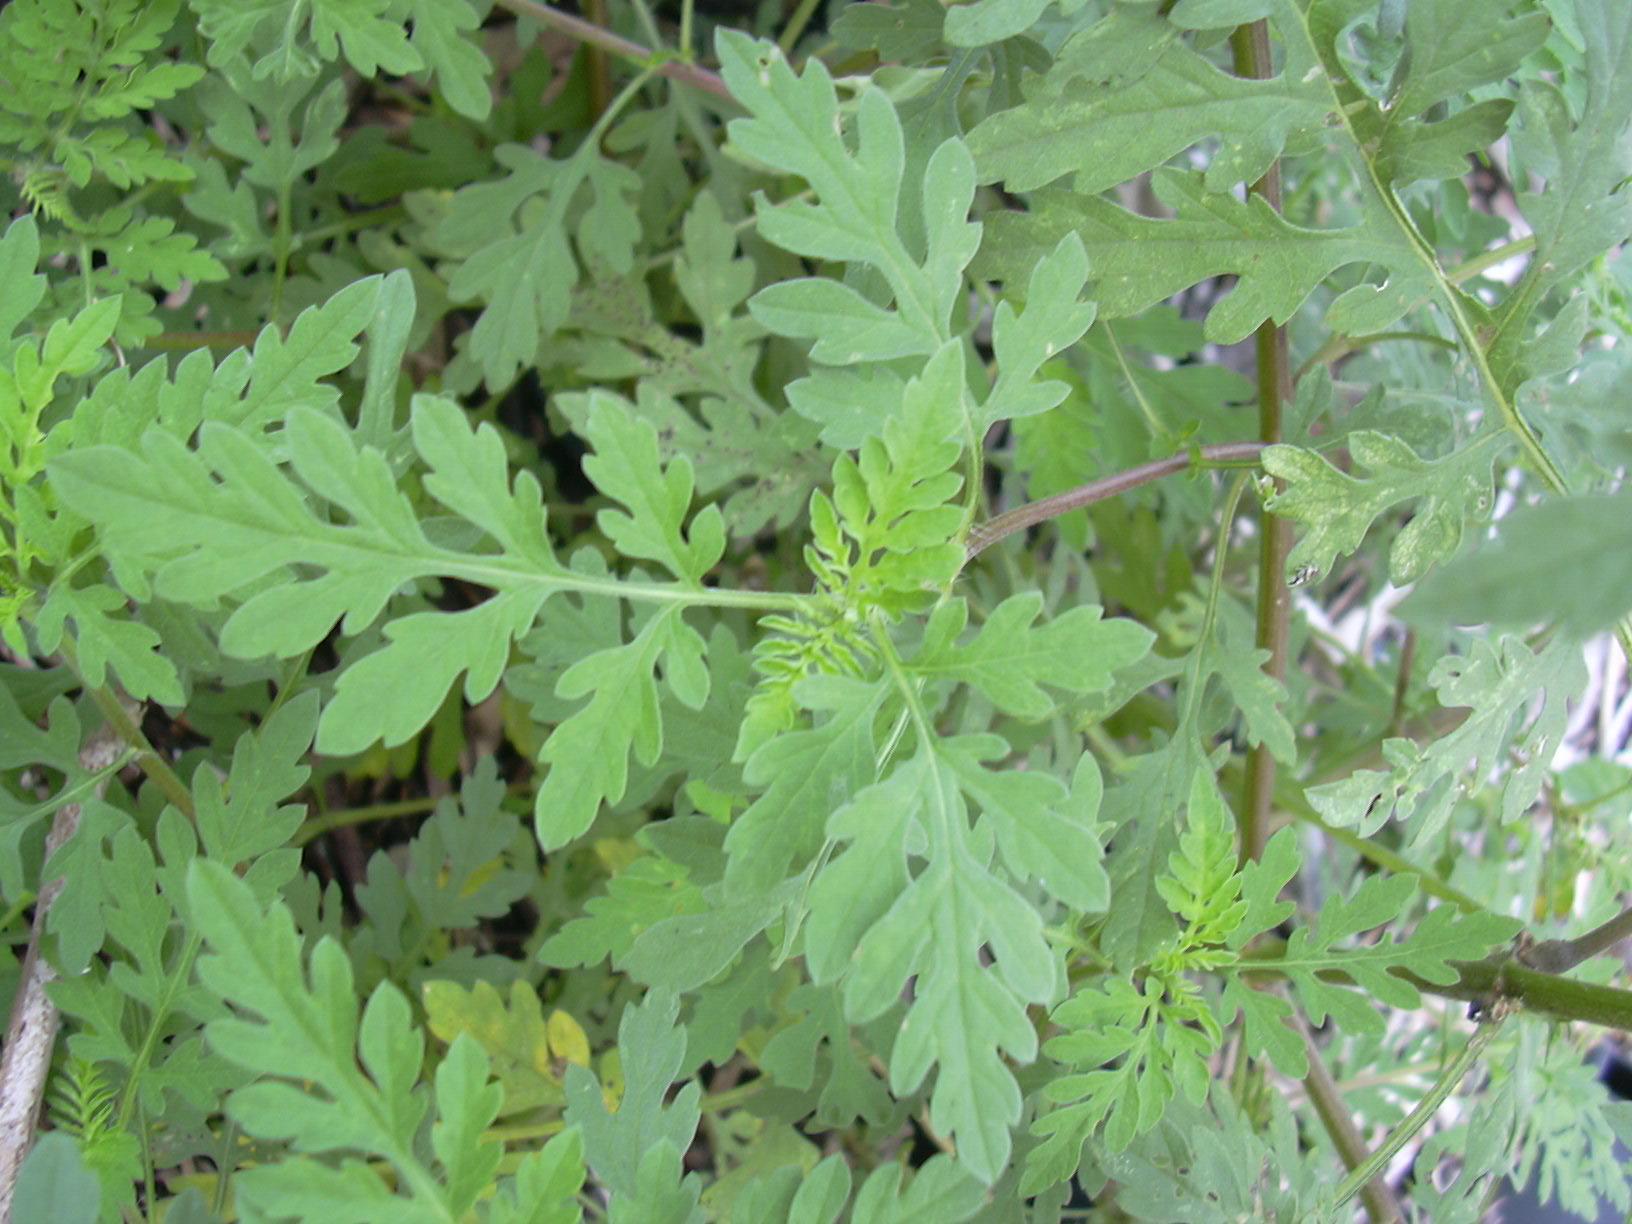 File:Starr 031108-3169 Ambrosia artemisiifolia.jpg - Wikimedia Commons